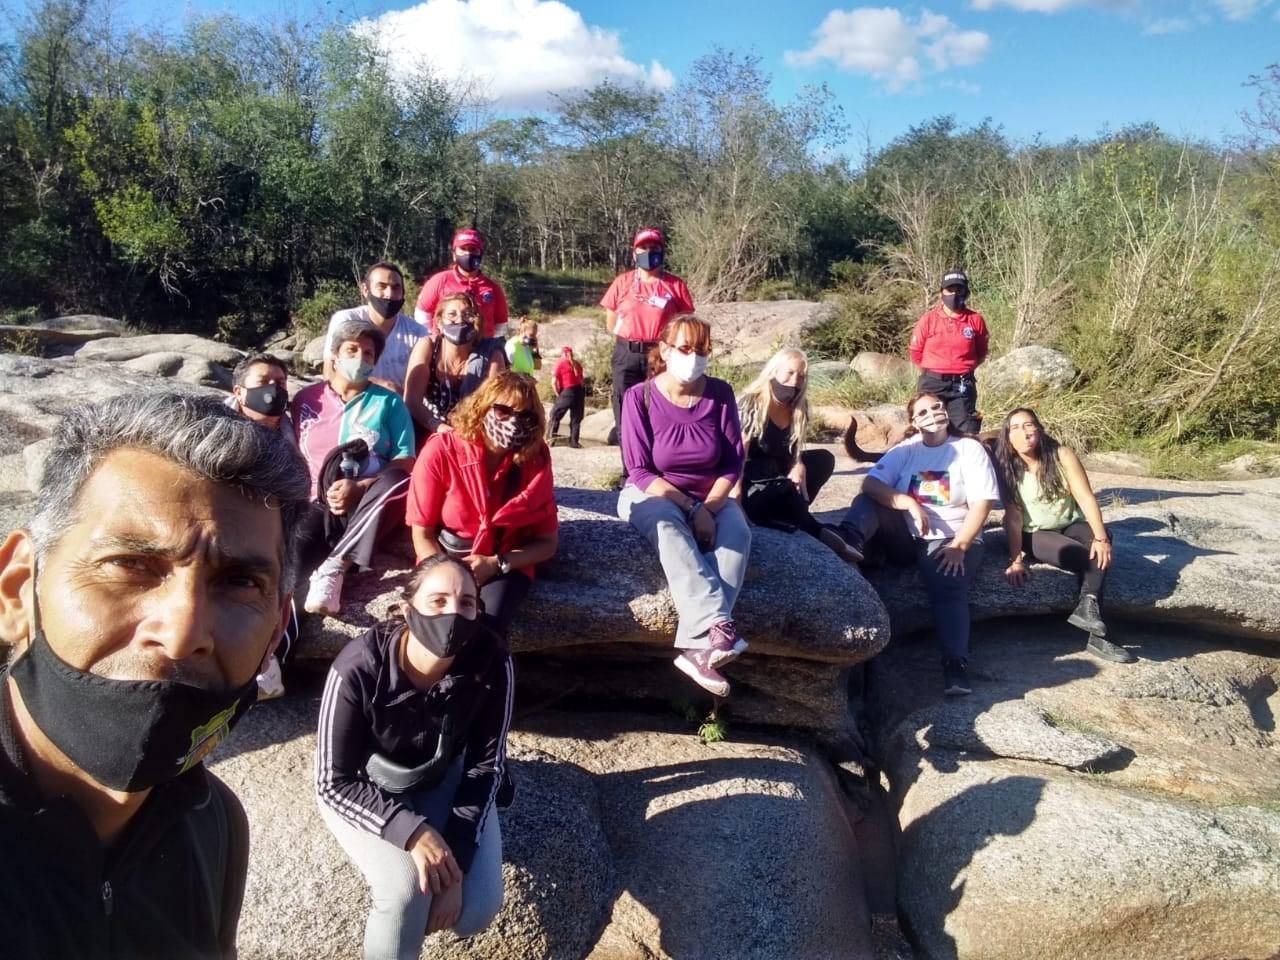 anisacate caminata - Anisacate: Se realizó caminata recreativa